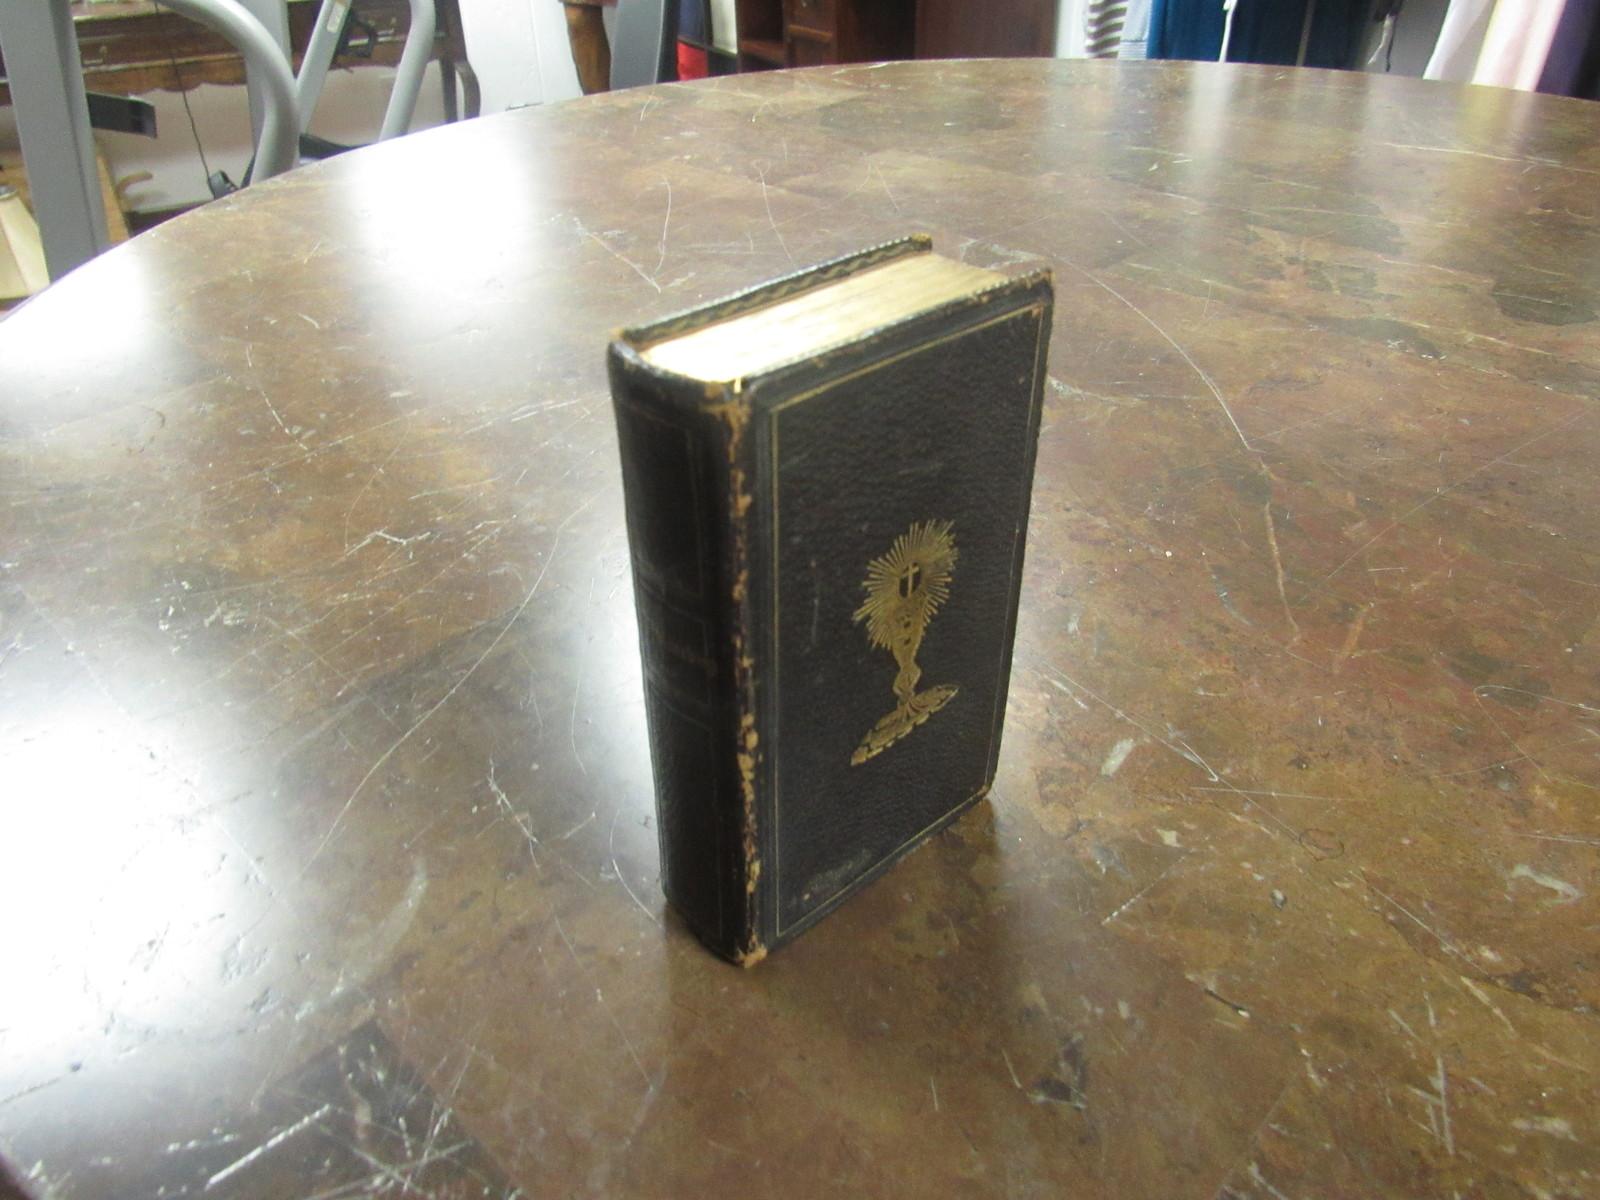 1844 DANISH HYMN BOOK